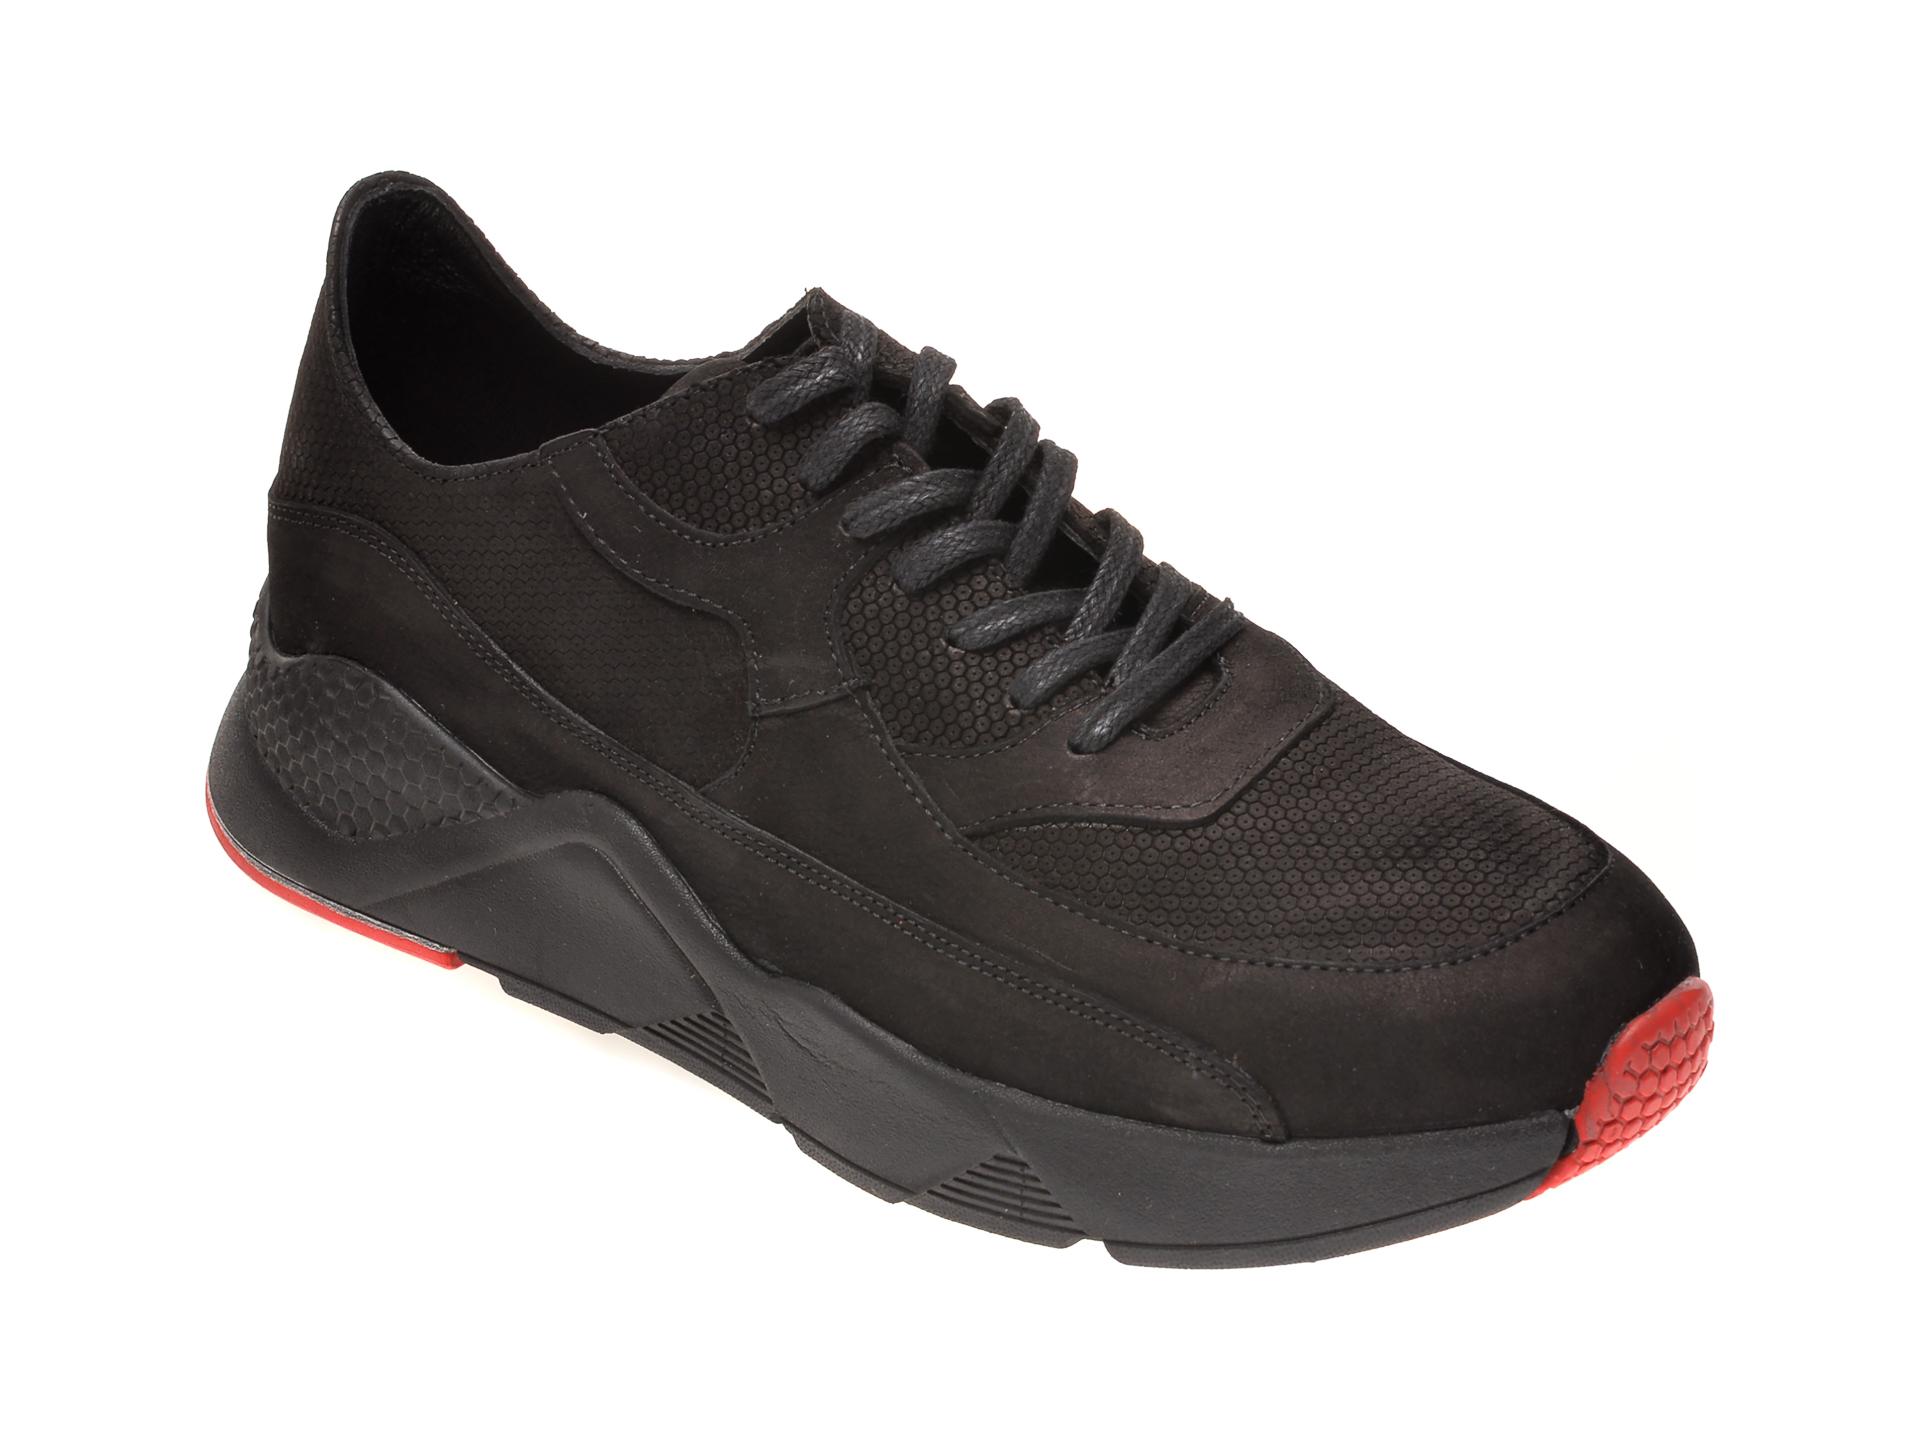 Pantofi OTTER negri, M5731, din piele intoarsa New